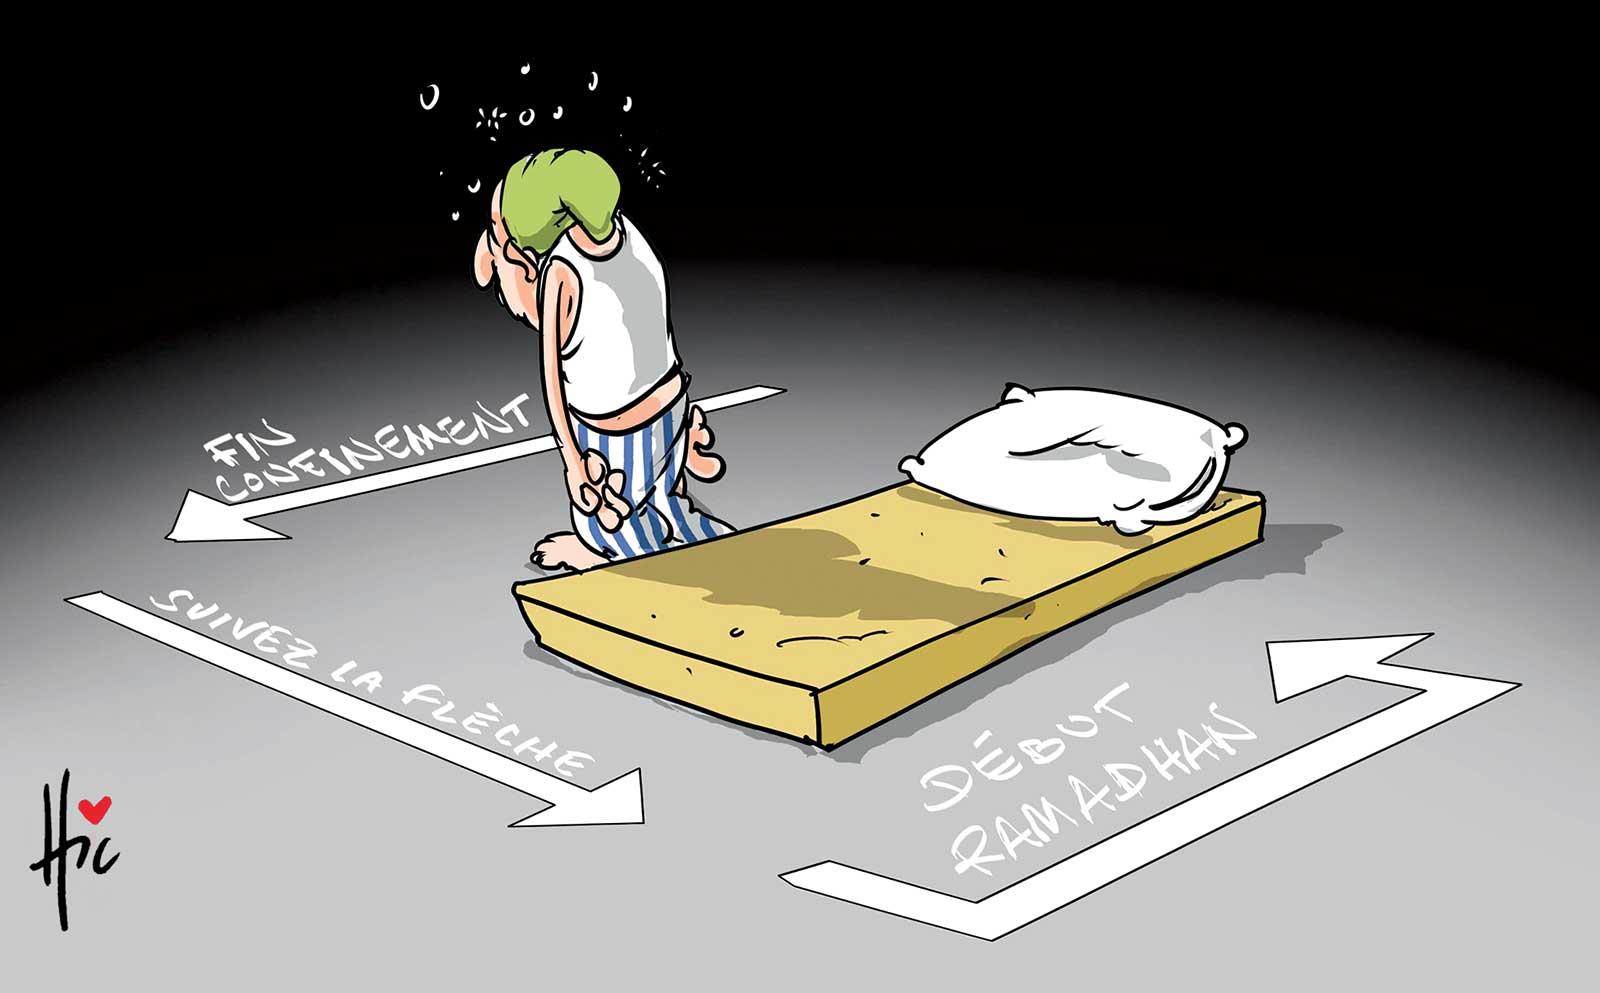 Début de ramadan 2020 en confinement - Dessins et Caricatures, Le Hic - El Watan - Gagdz.com